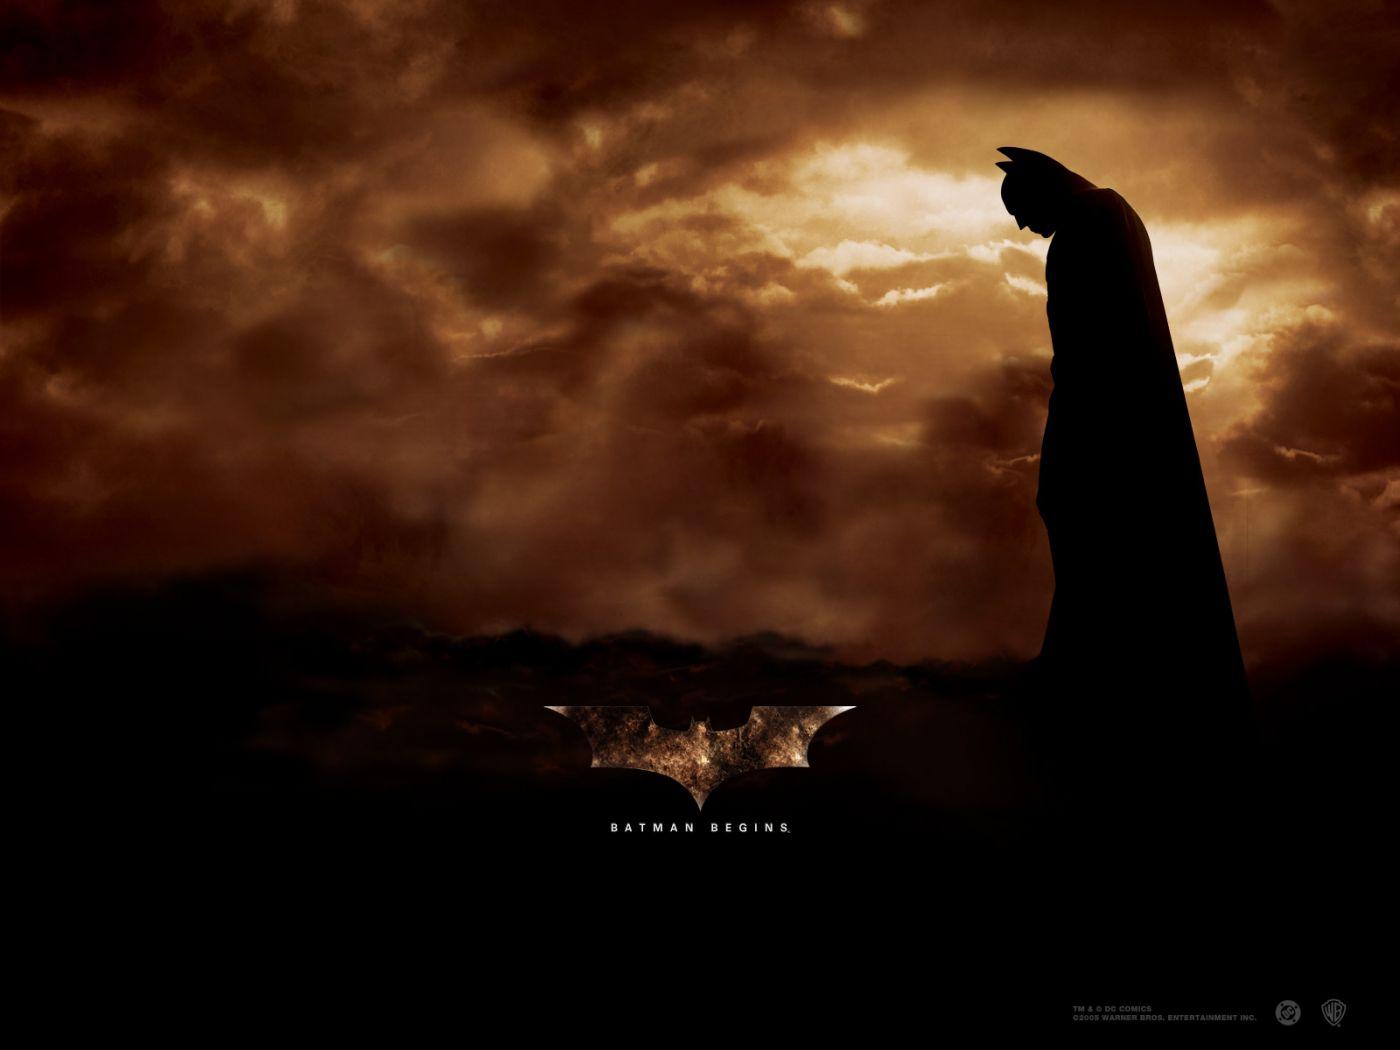 Batman Clouds Background Poster Wallpaper 1400x1050